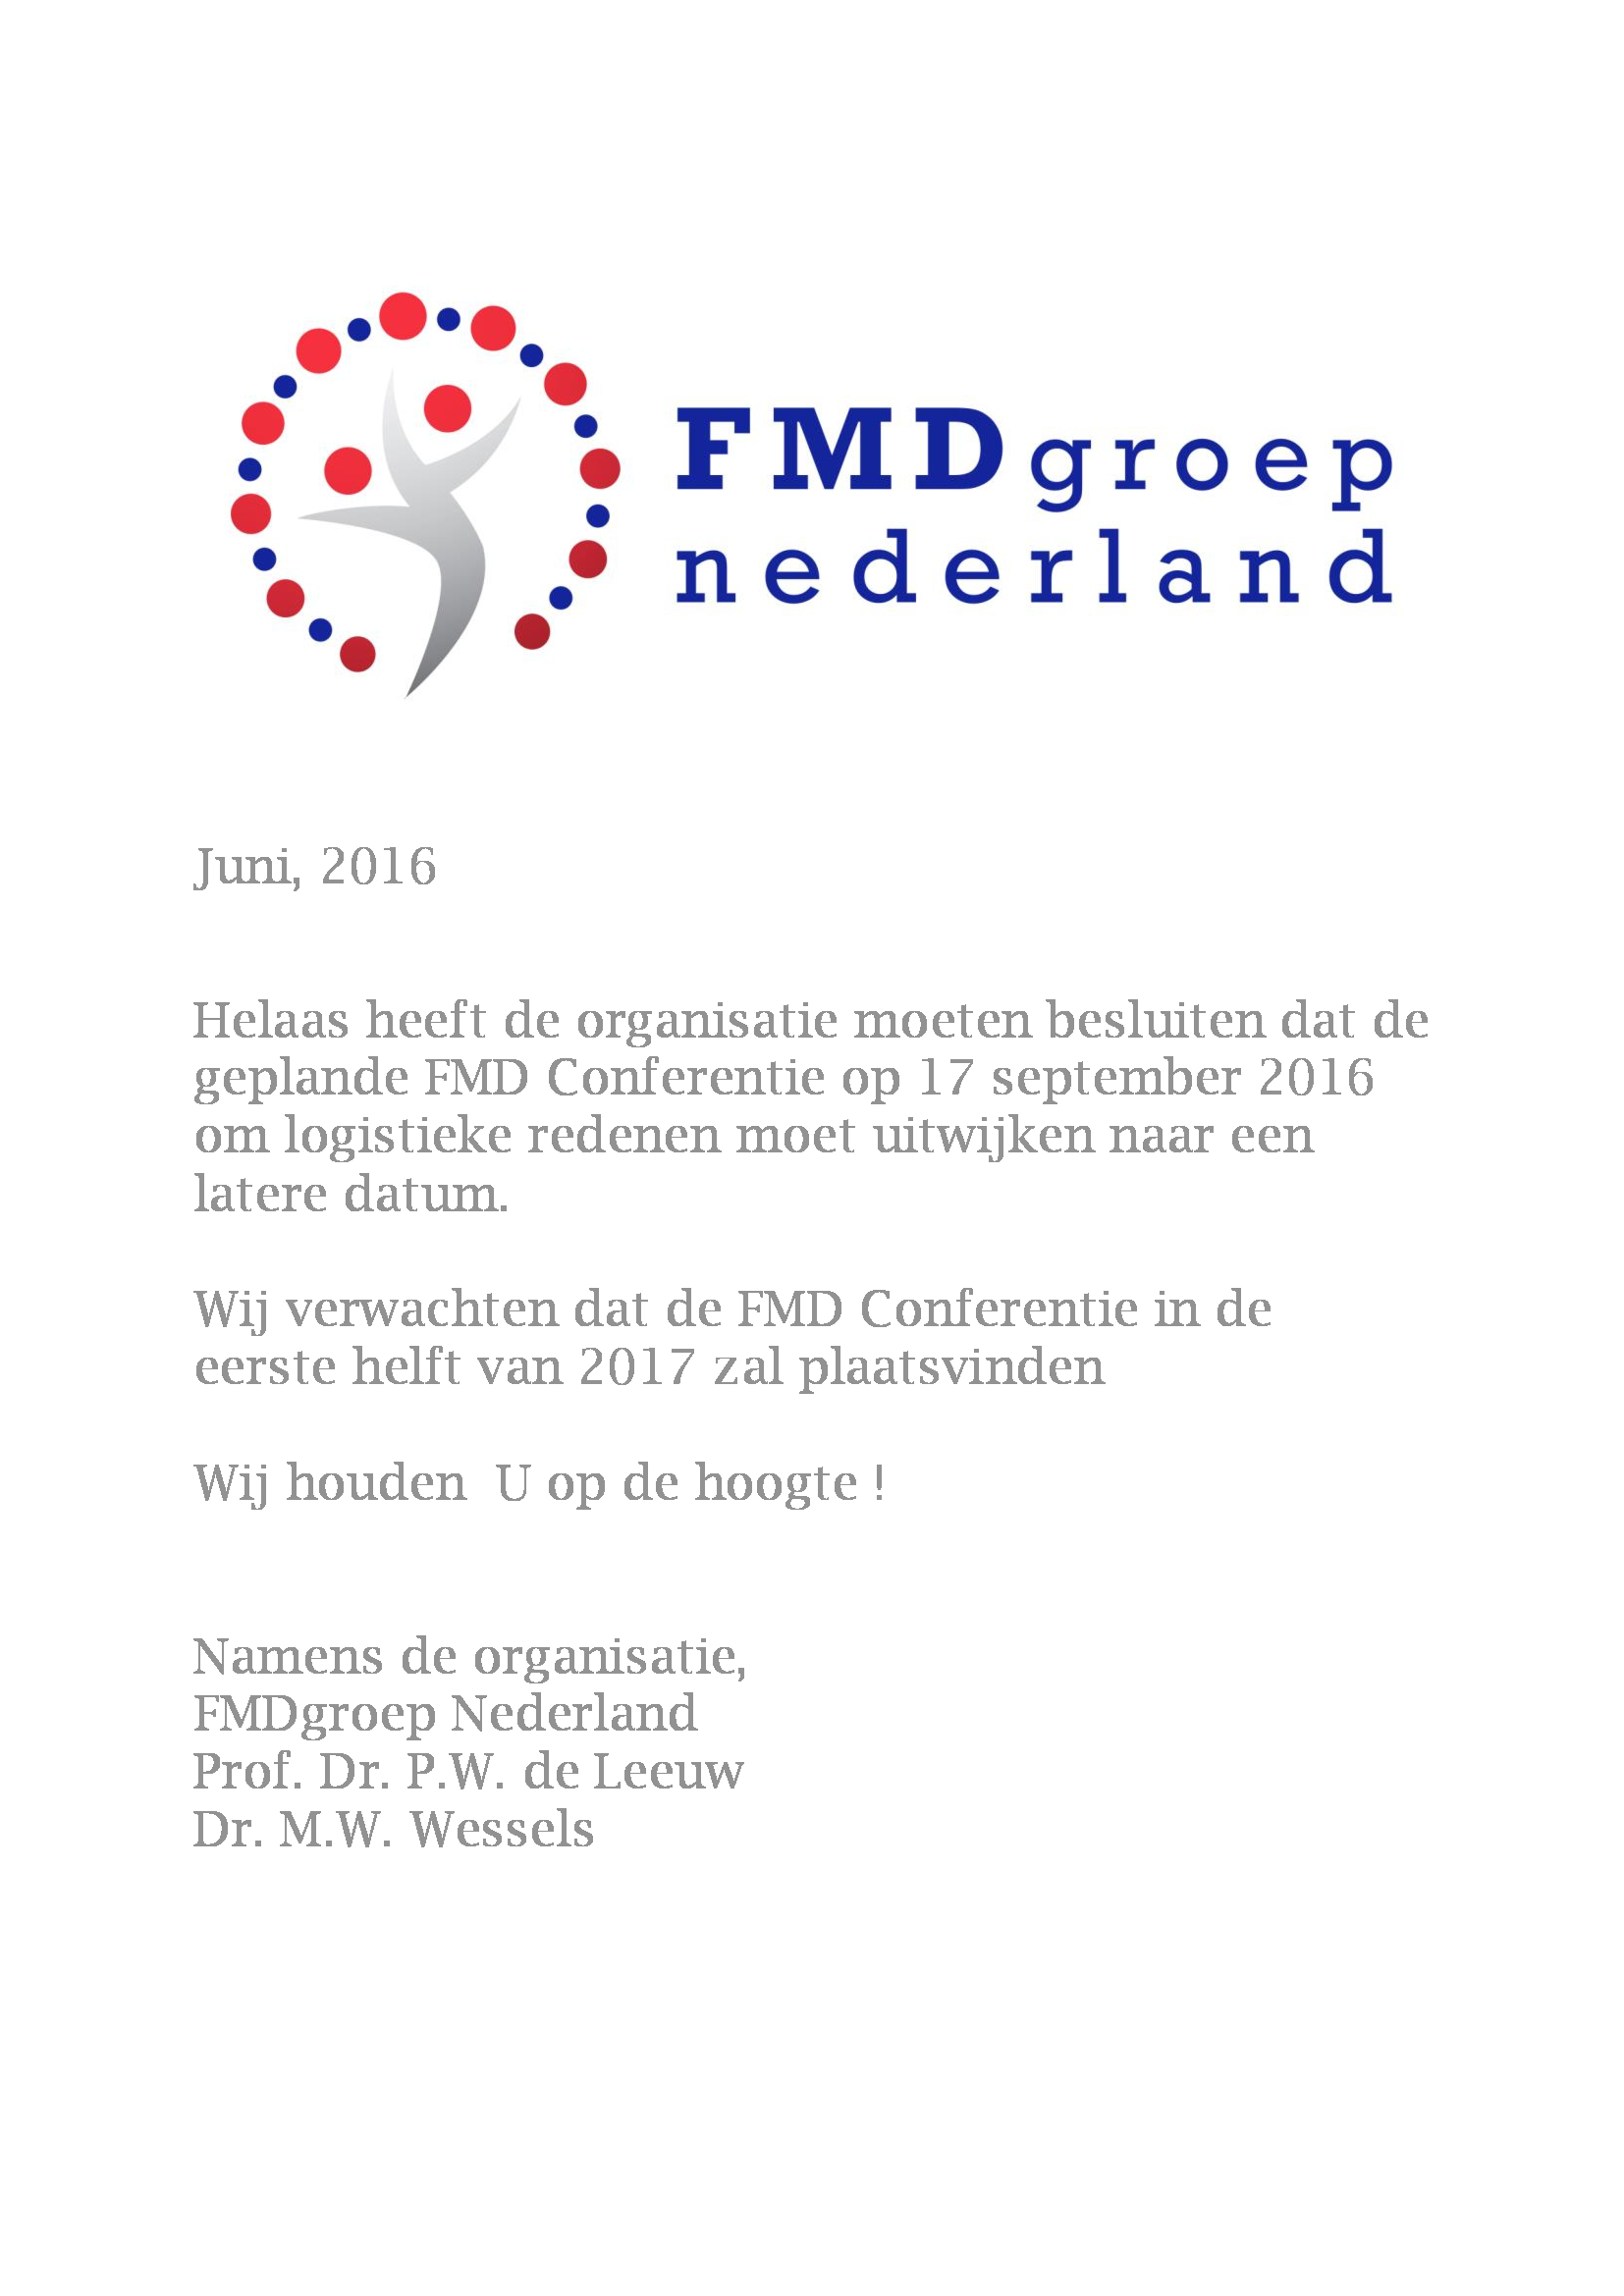 FMD-LOGISTIEK